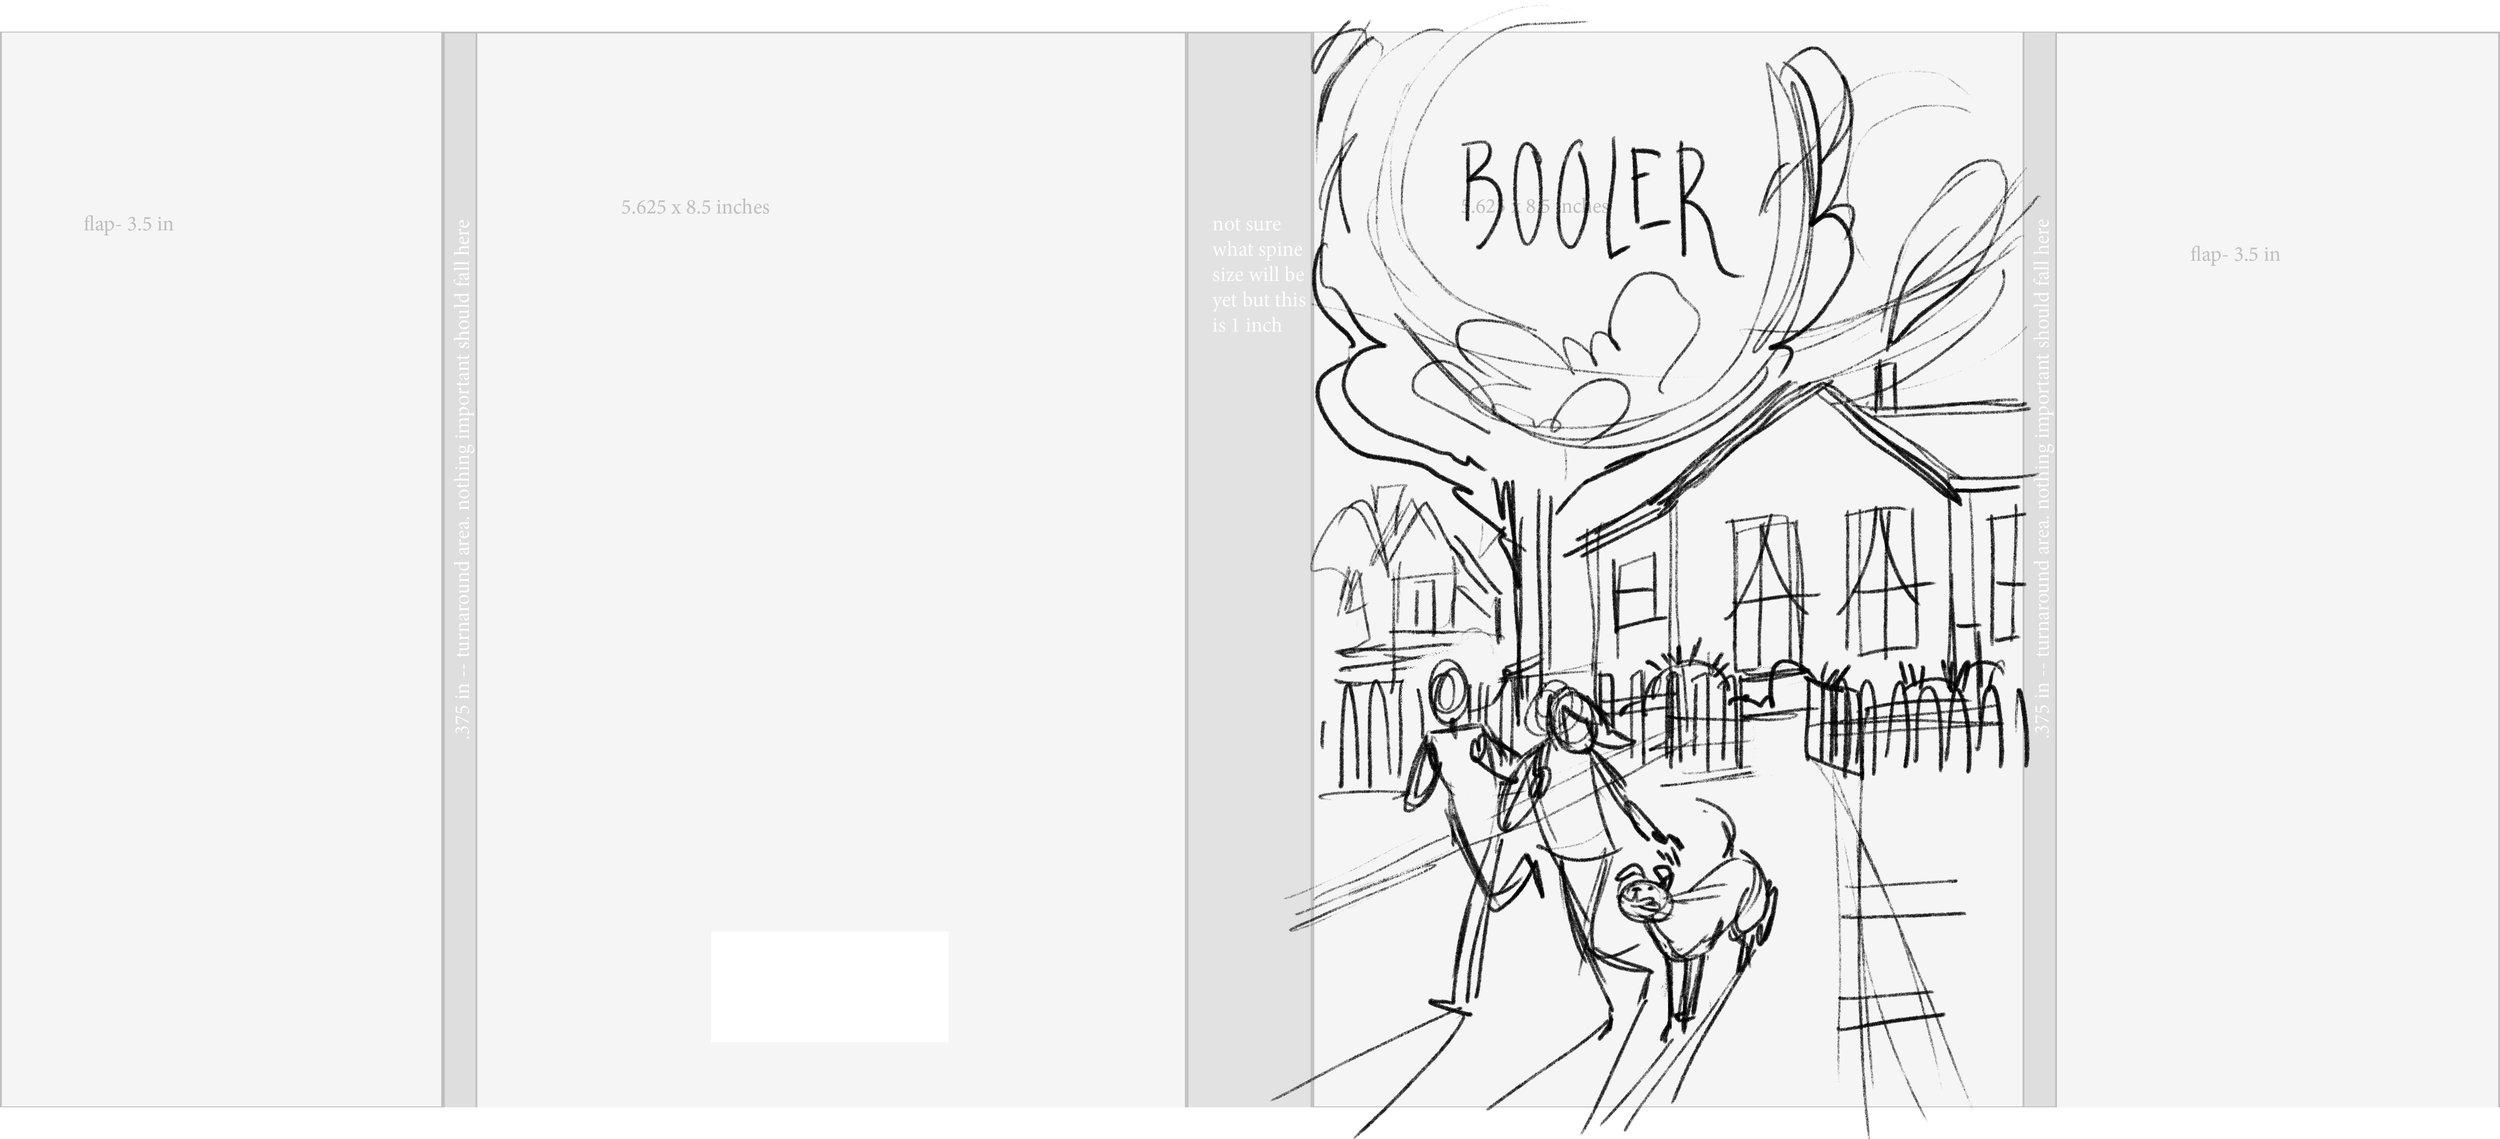 Booler_cover_skecth_8.jpg